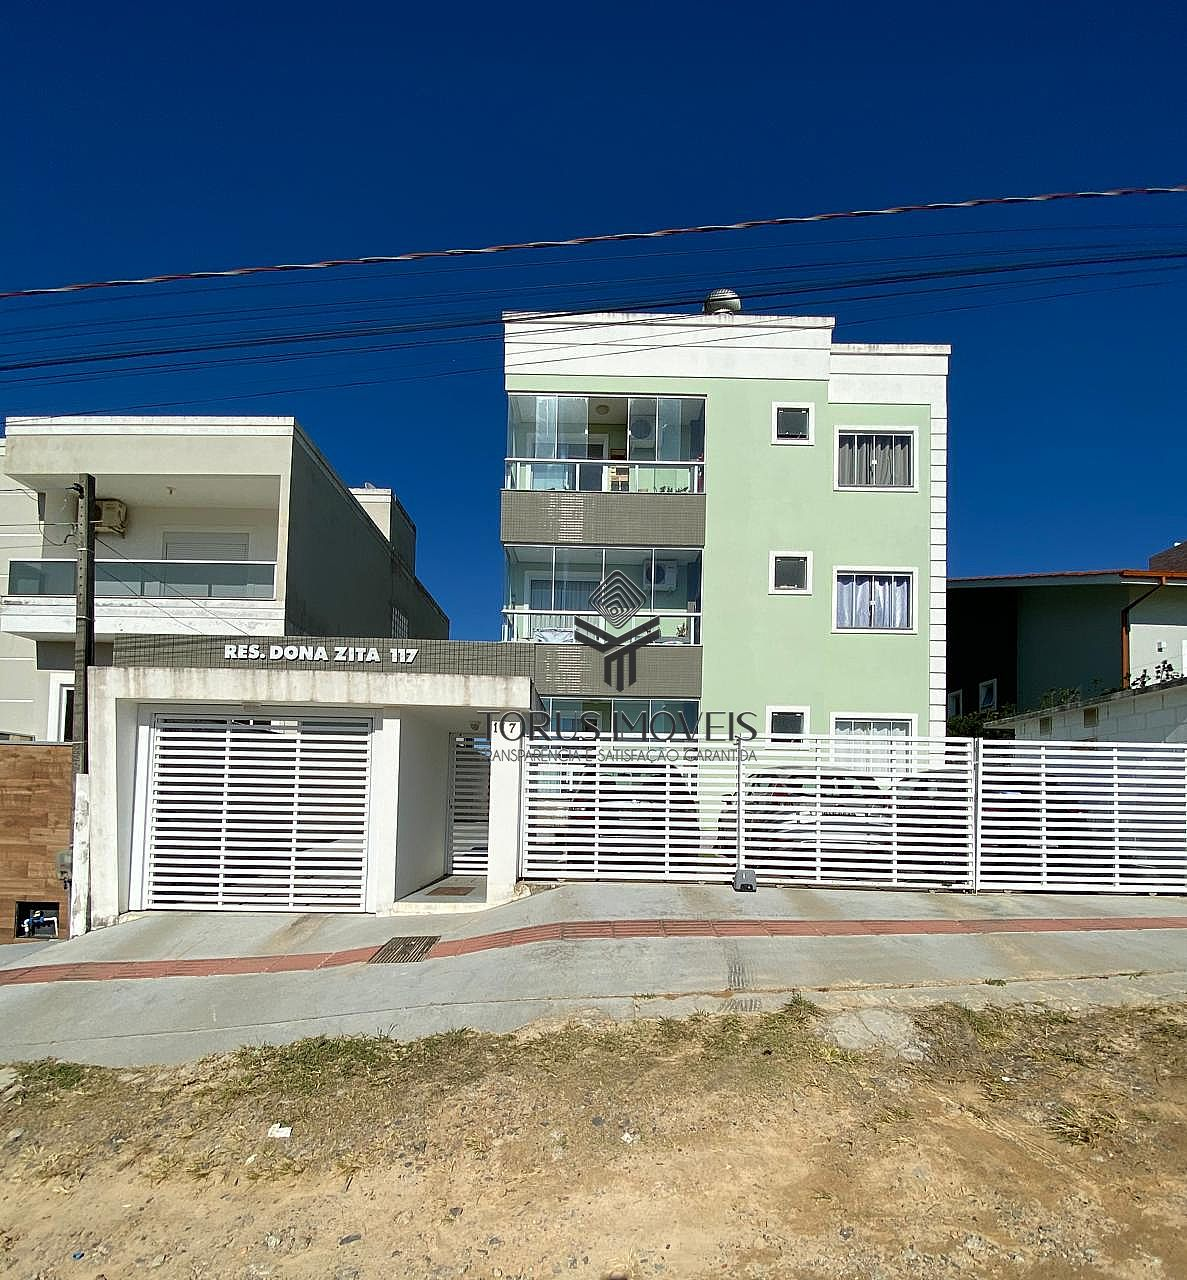 ApartamentoImbituba Village Residencial Dona Zita